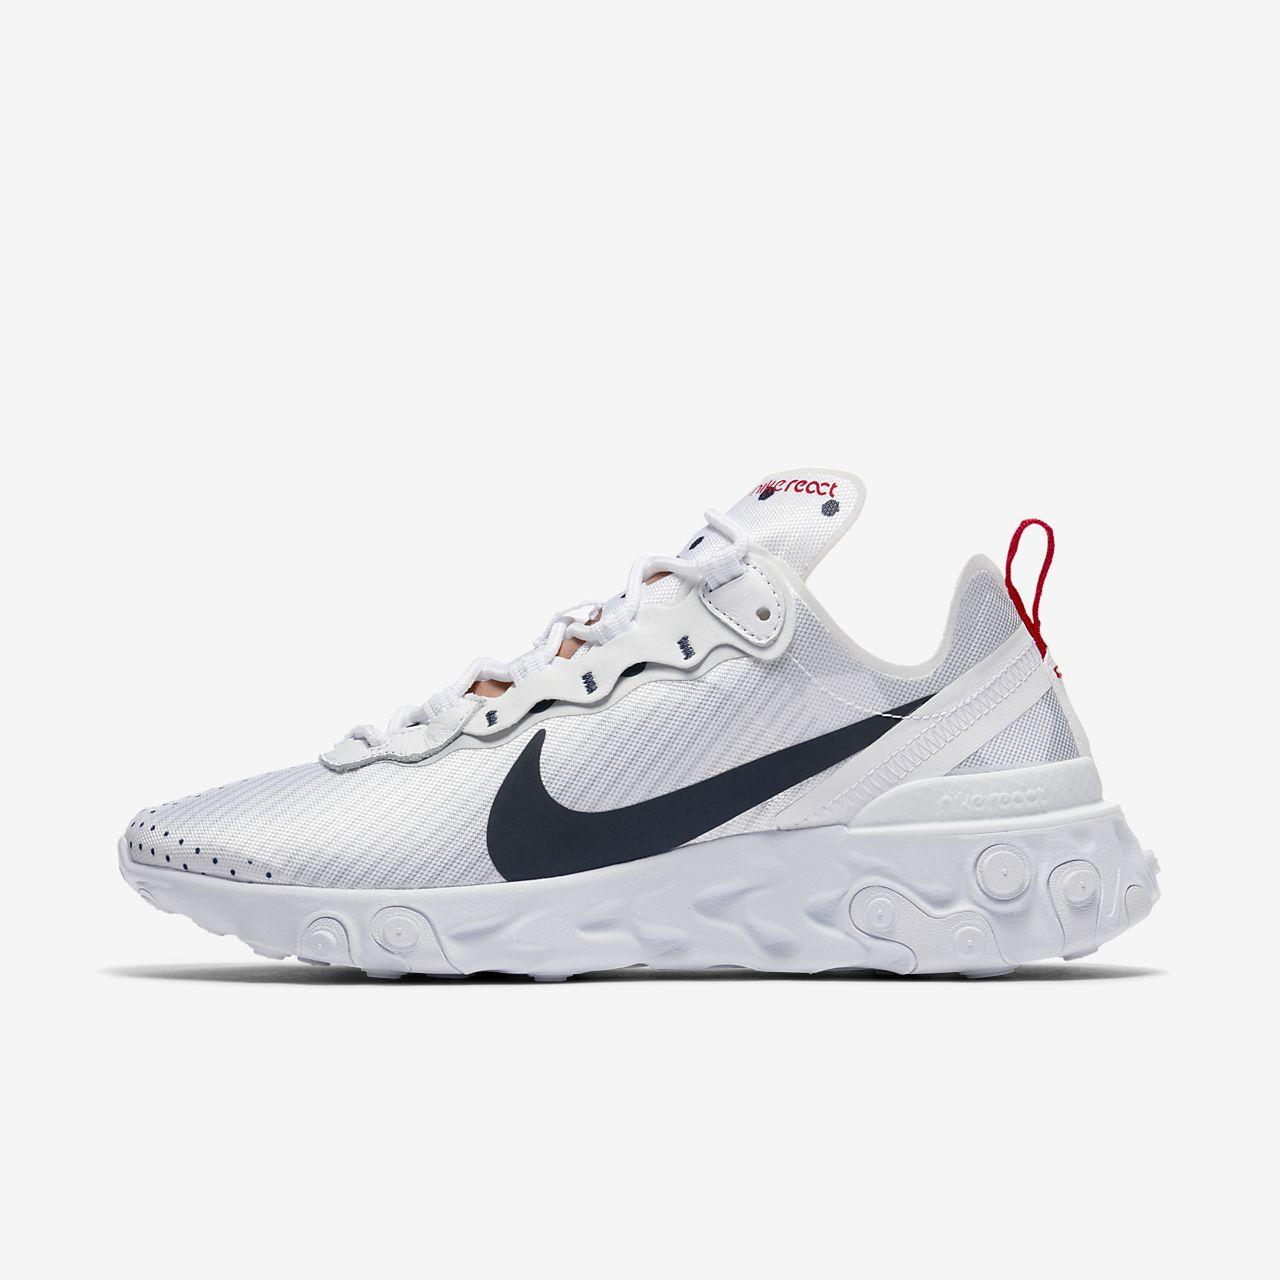 Dámská bota Nike React Element 55 Premium Unité Totale